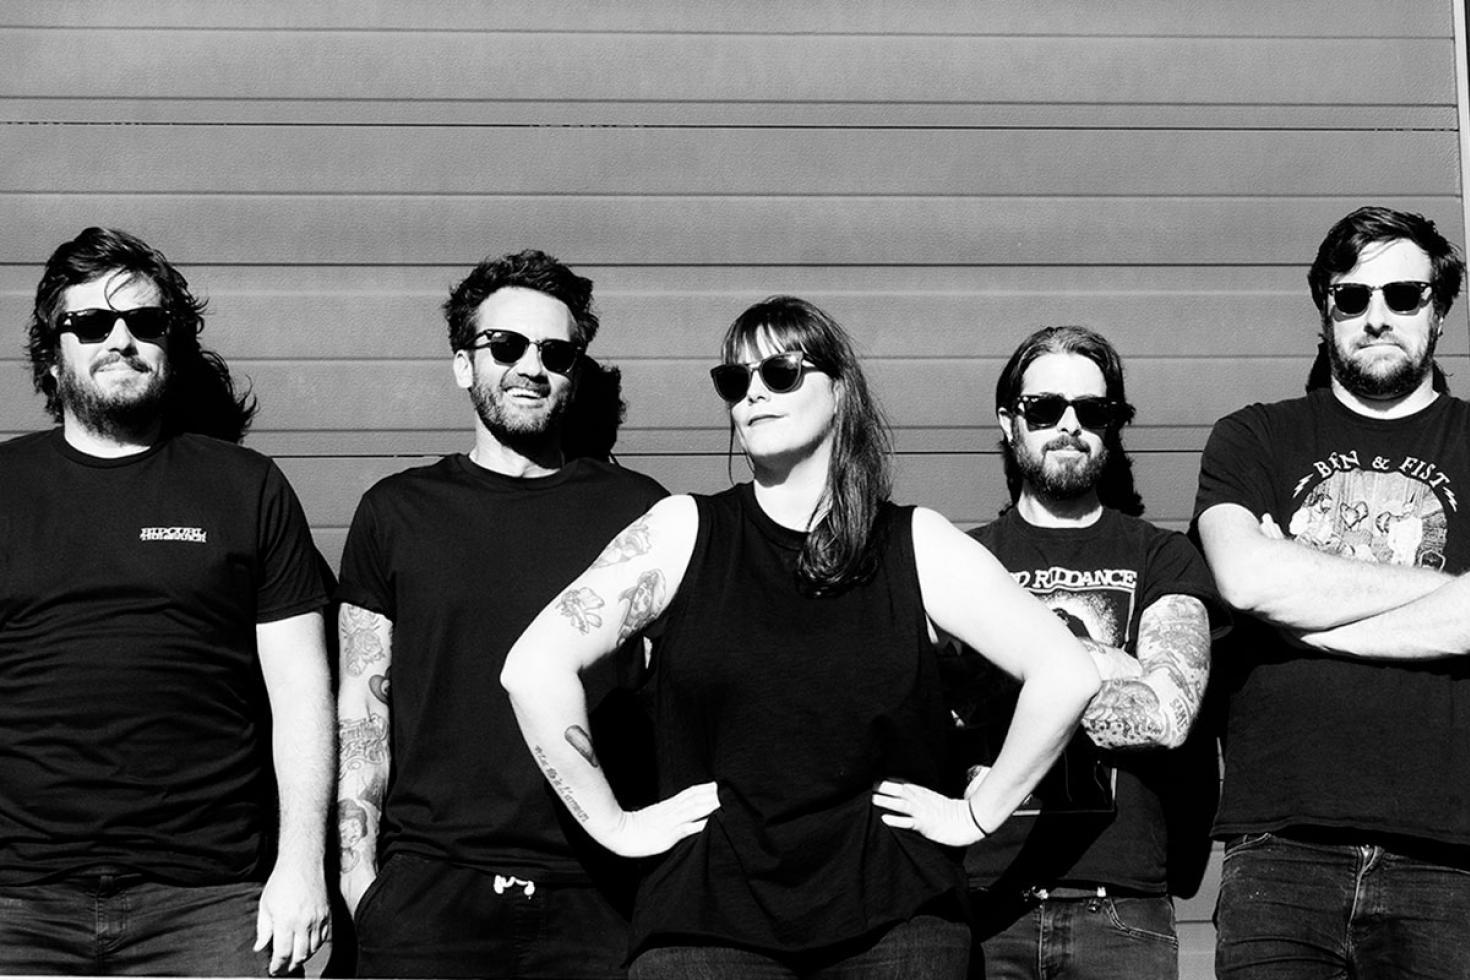 PREMIERE: The Dead Krazukies share video for new single 'The Sun'